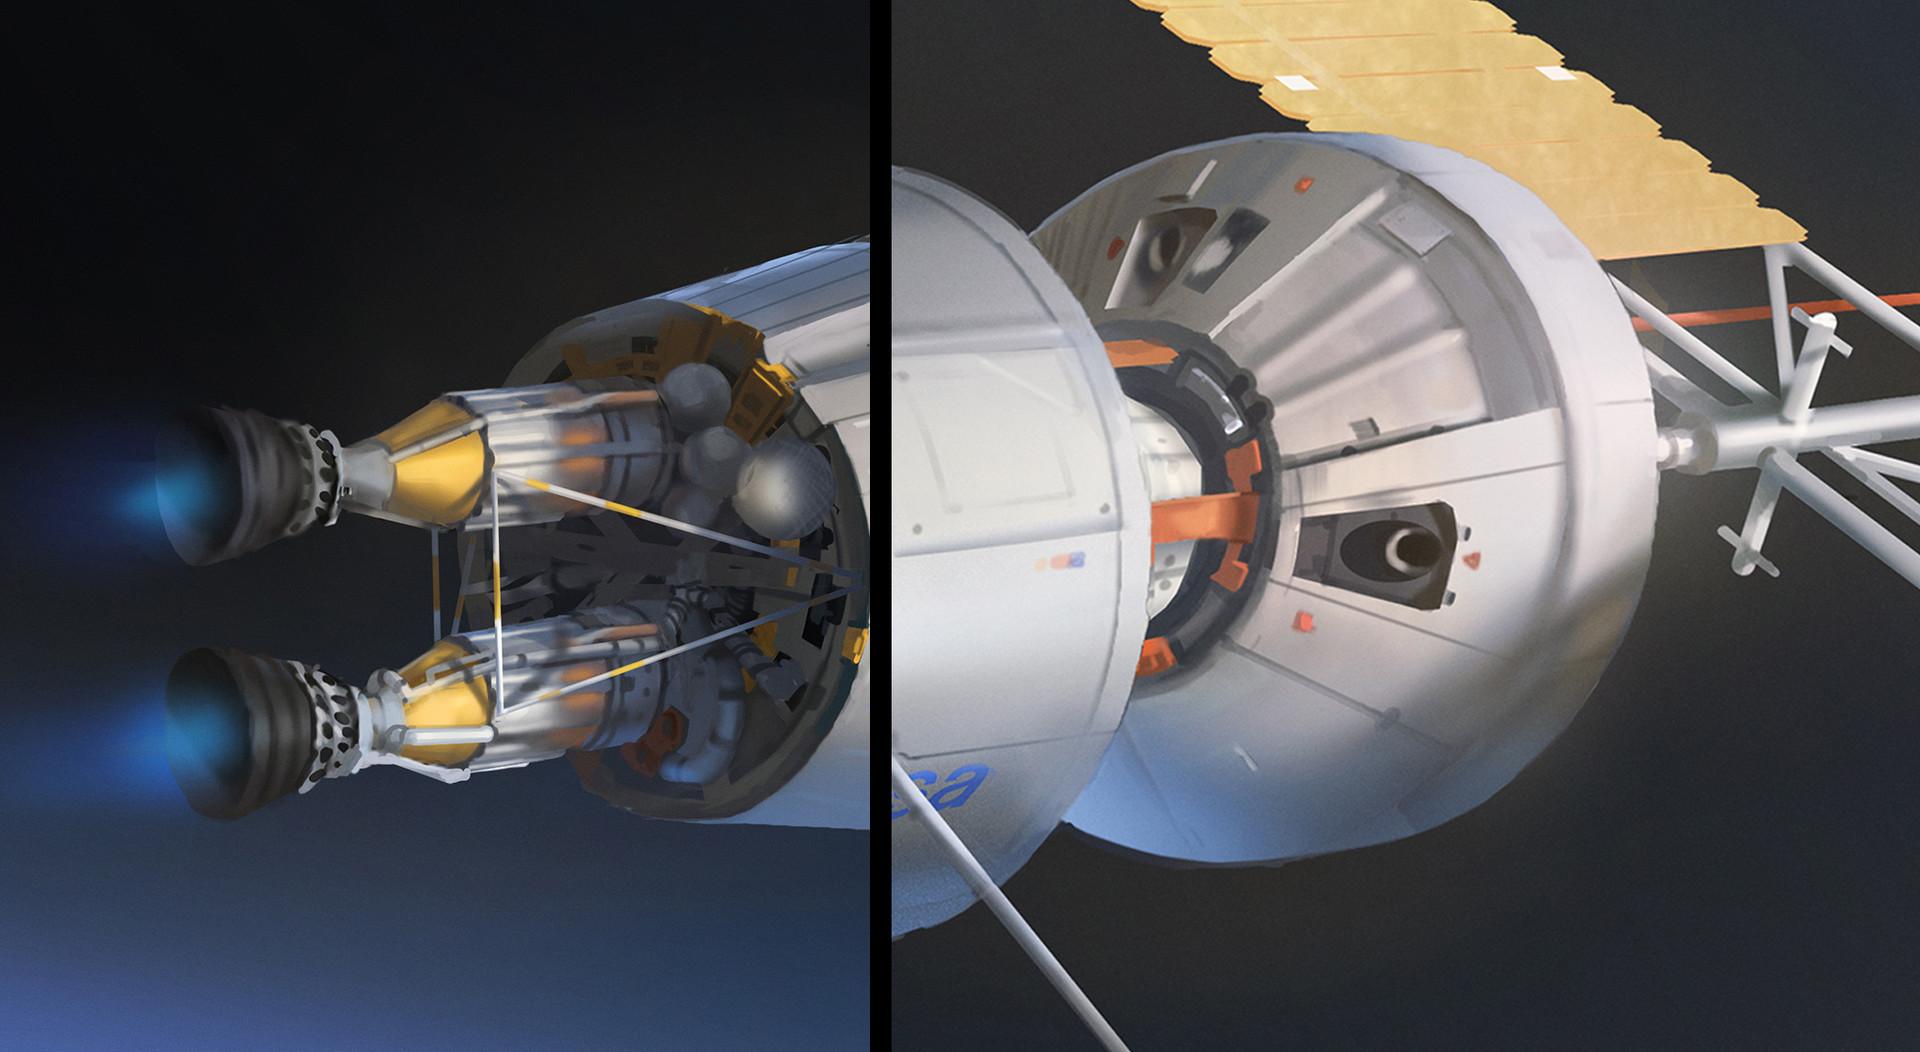 Adrien girod spaceship06 72 close